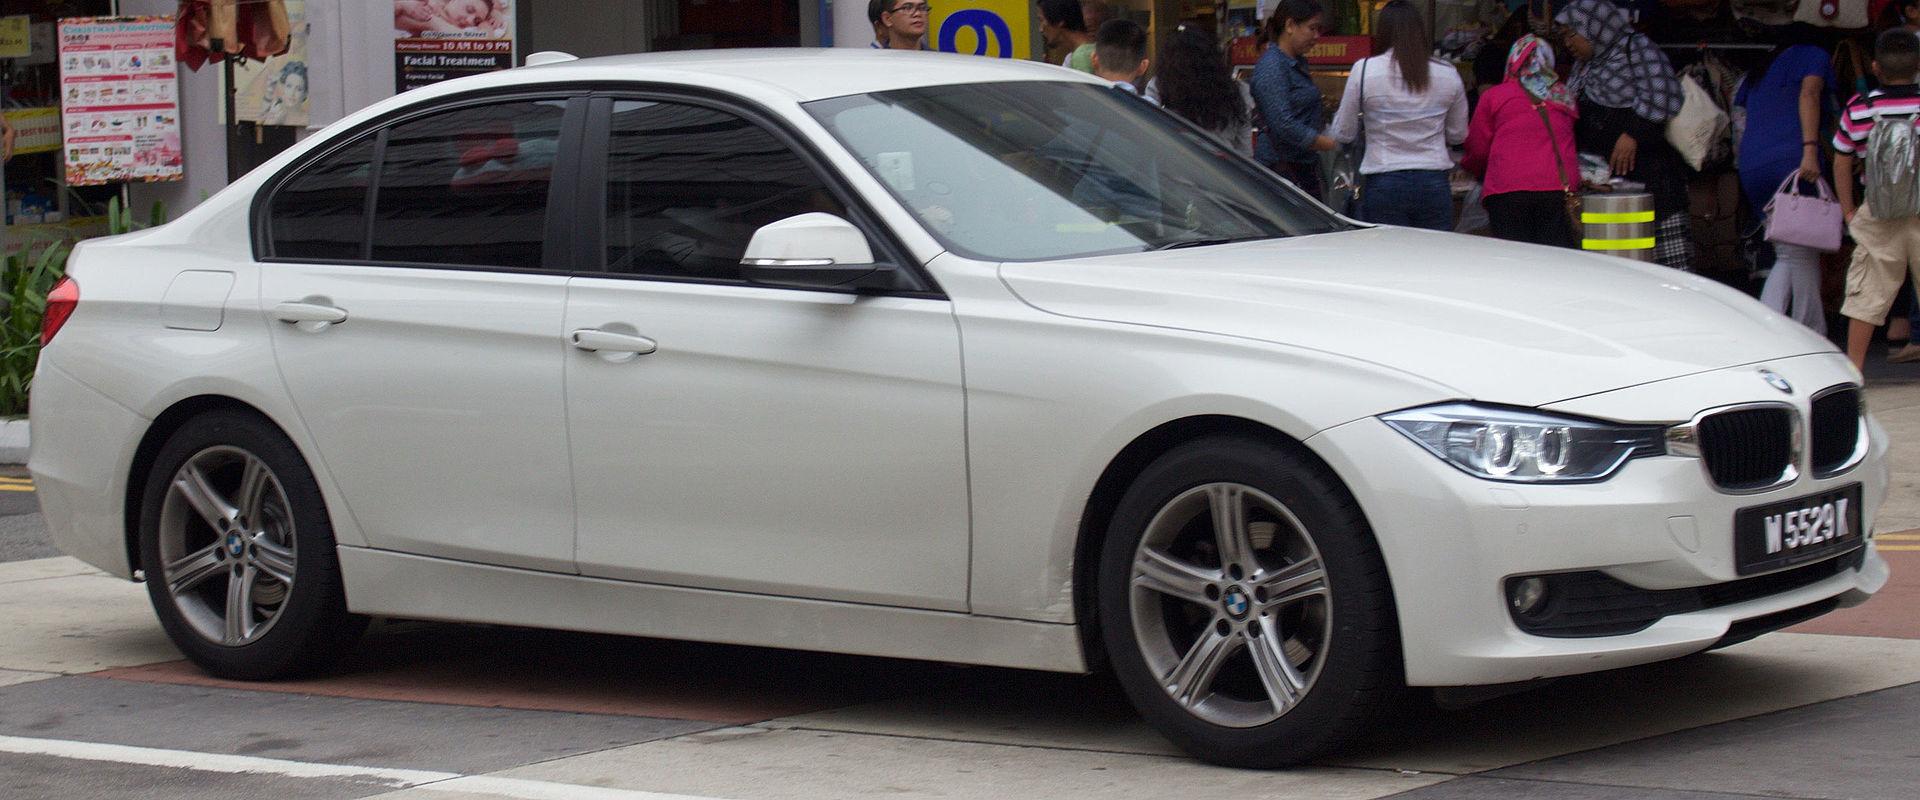 2012-2015 BMW 318i (F30) sedan (2016-01-03) 01.jpg